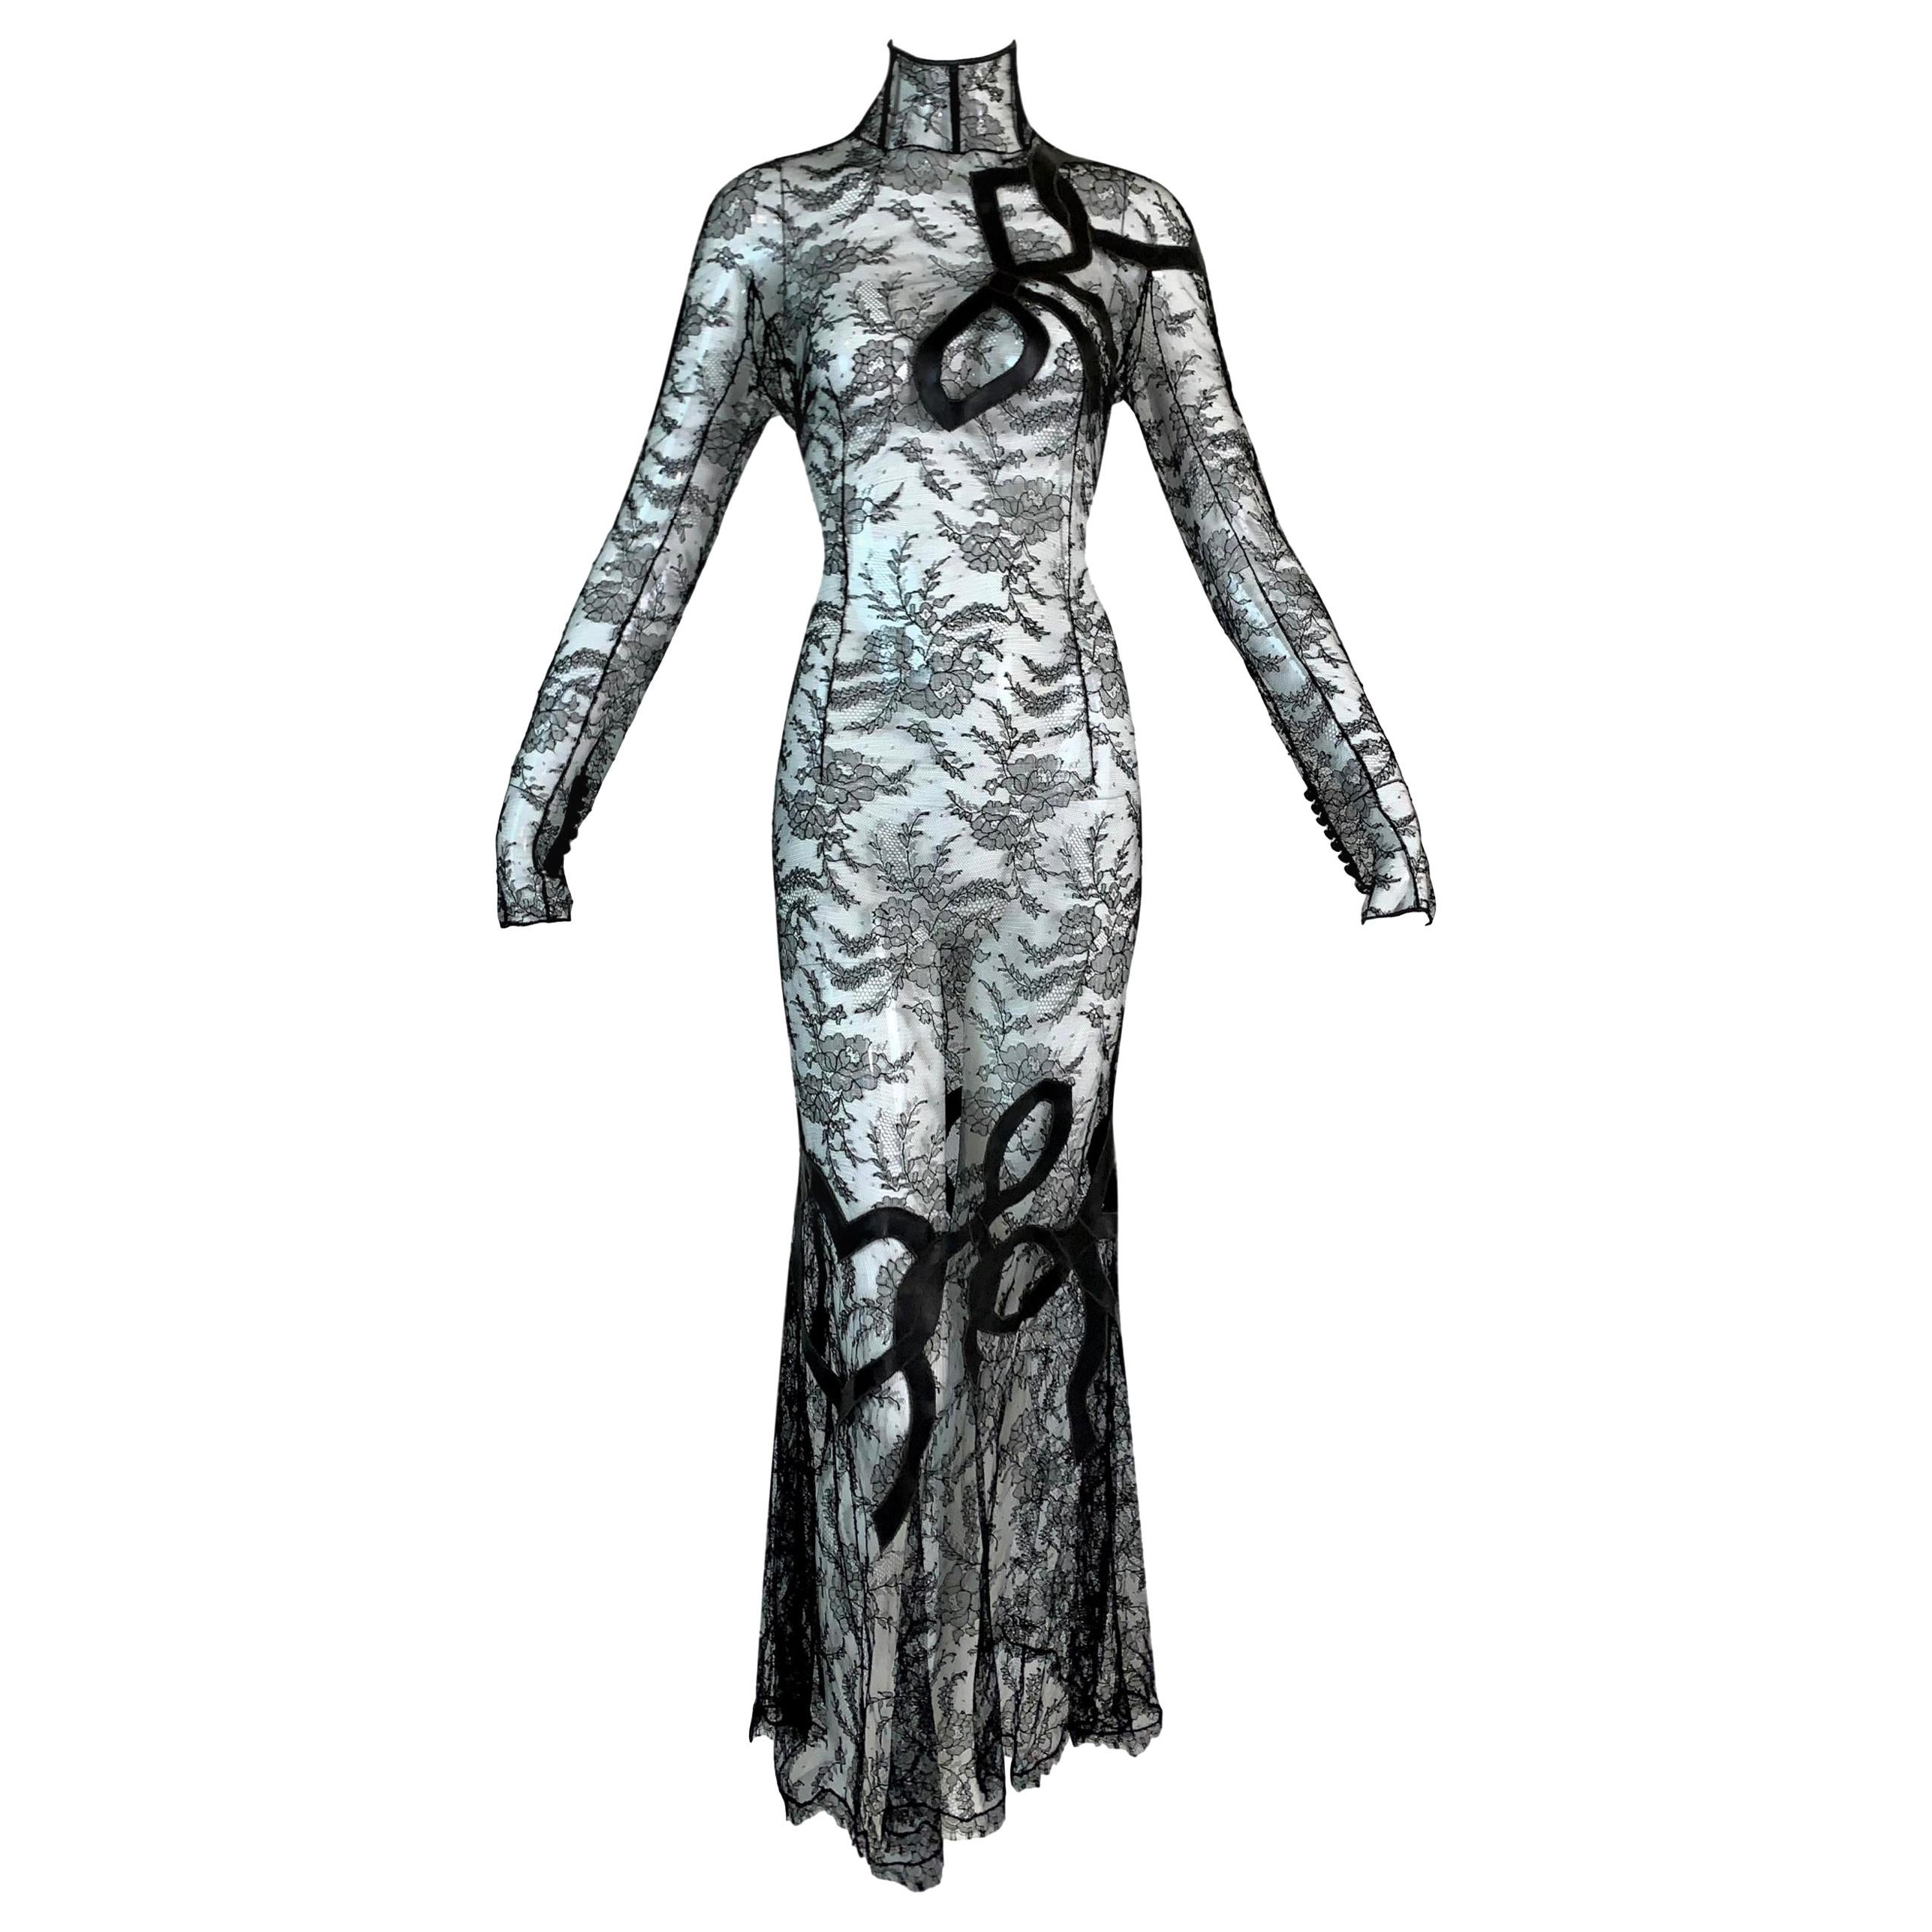 F/W 2001 John Galliano Sheer Black Lace Brown Silk Ribbon Details Gown Dress